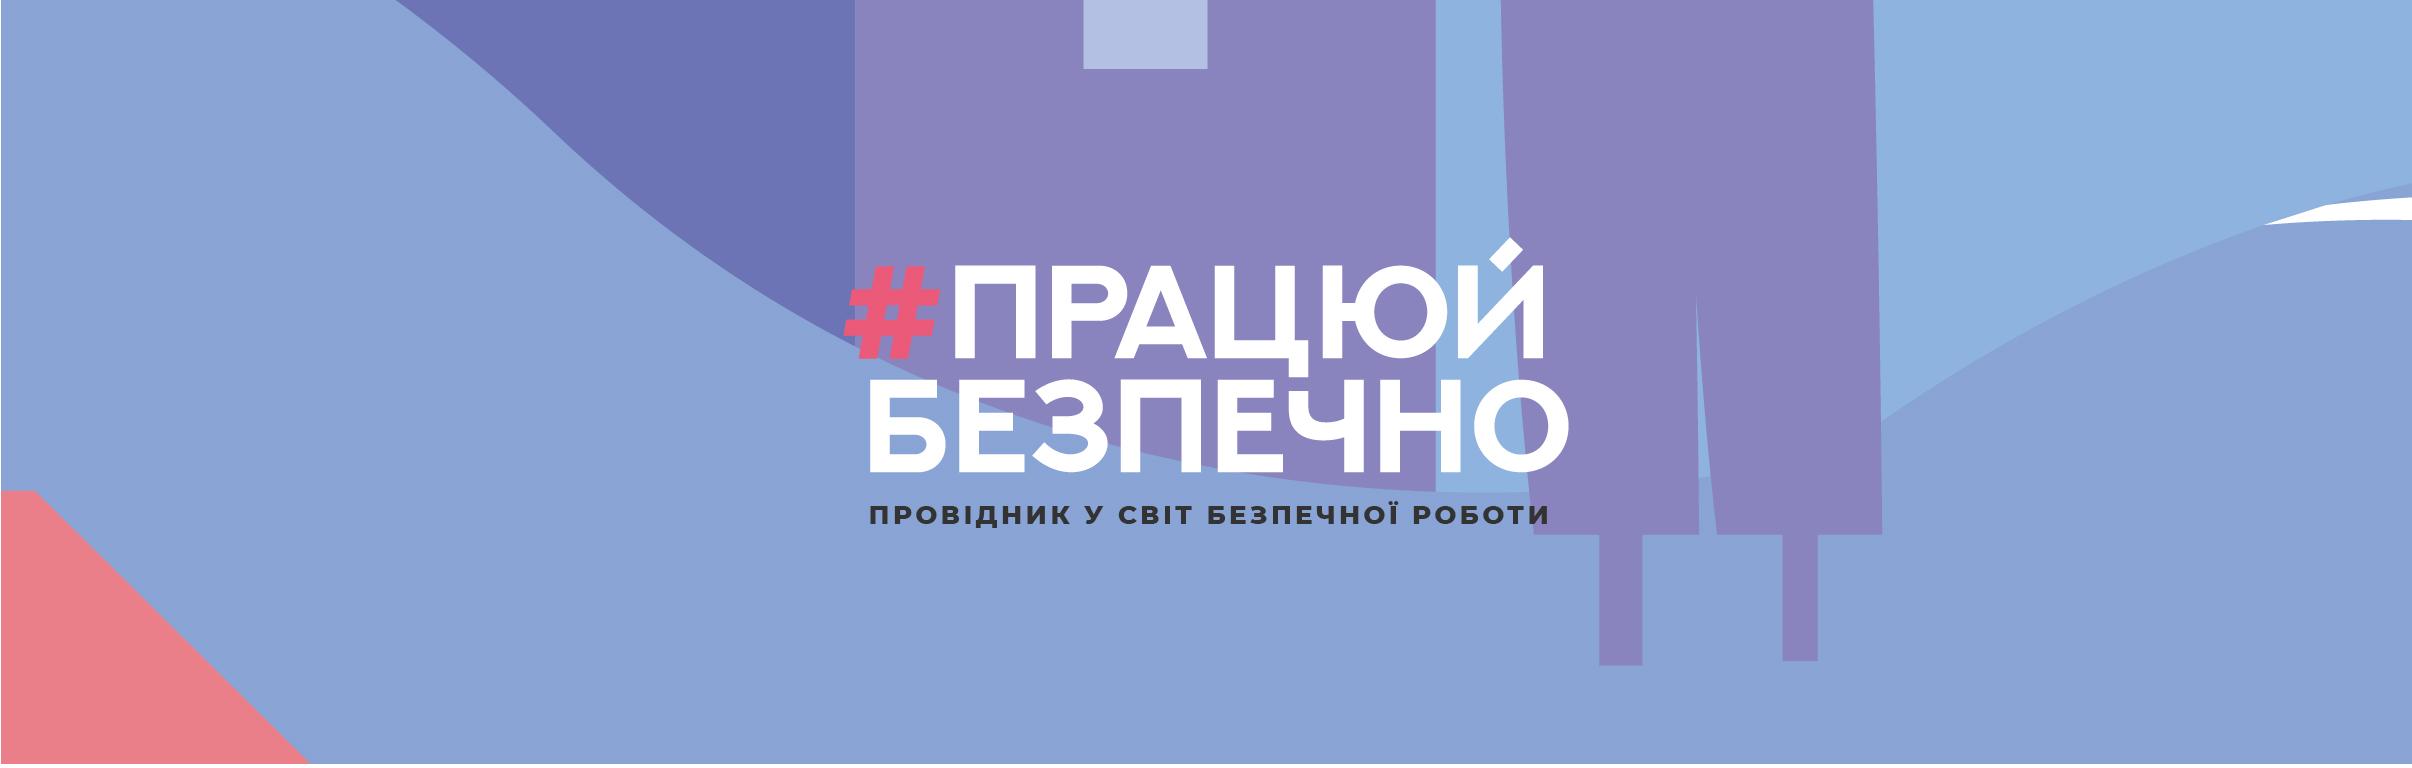 https://apost.otg.dp.gov.ua/storage/app/uploads/public/5f1/fcd/3ee/5f1fcd3eede2a907931192.jpg